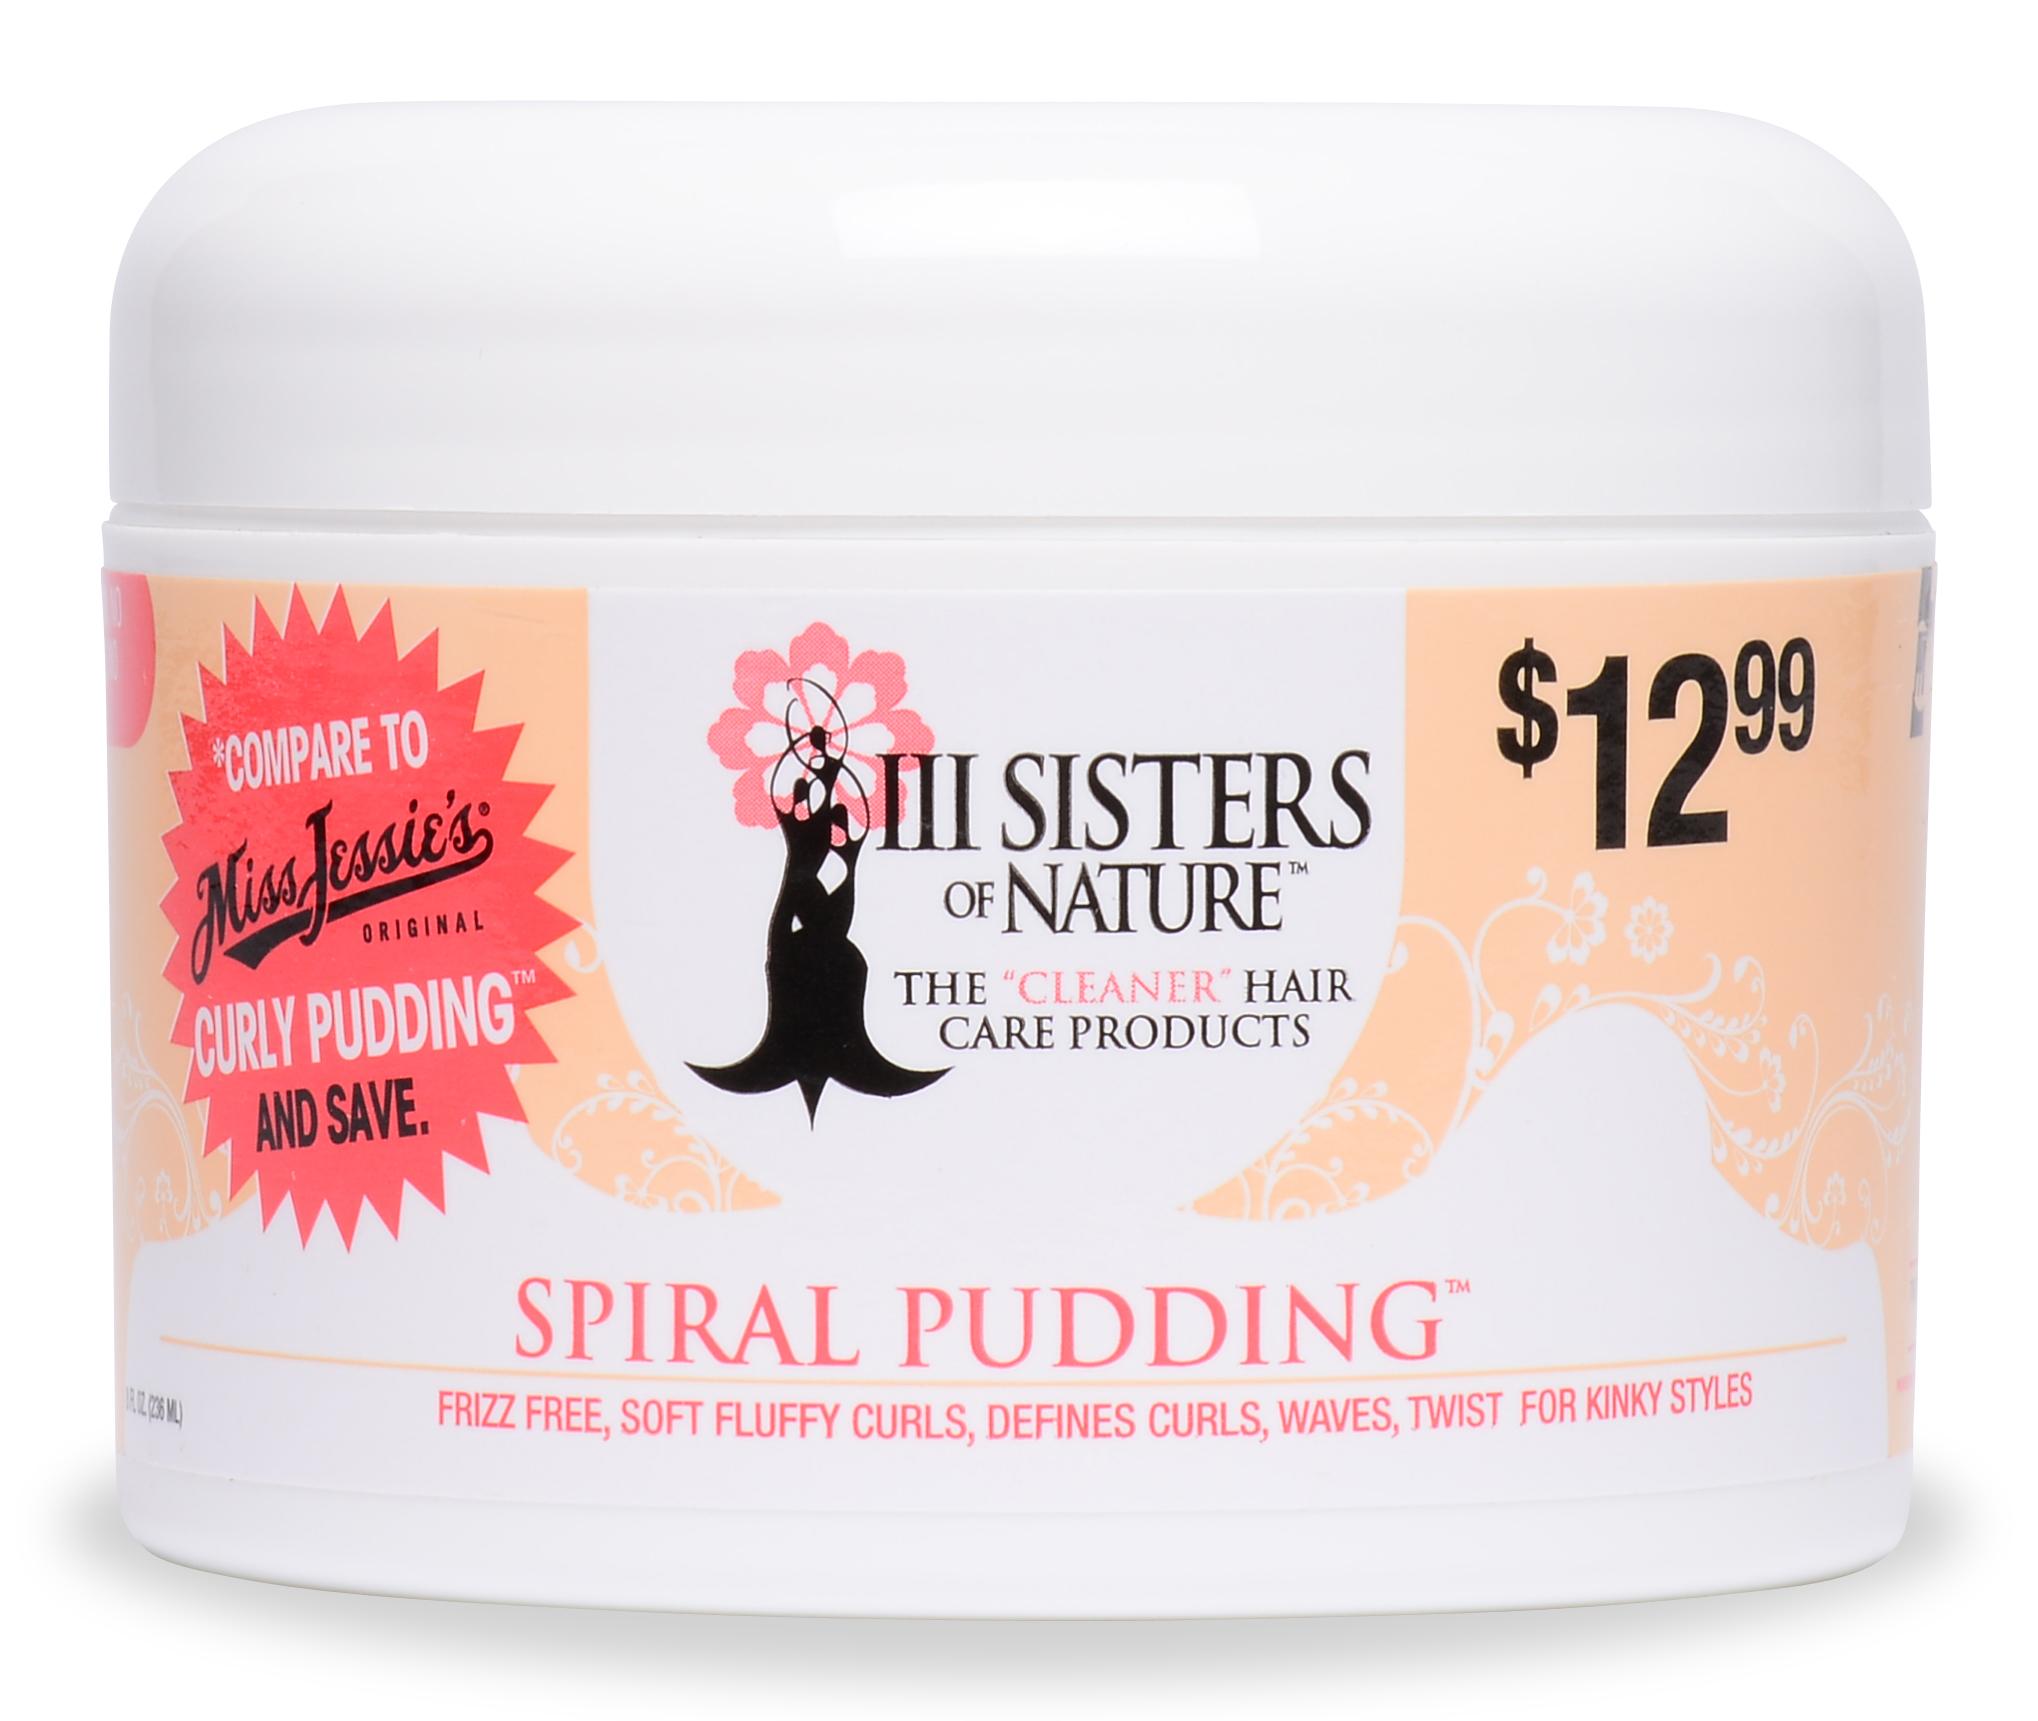 Spiral Pudding